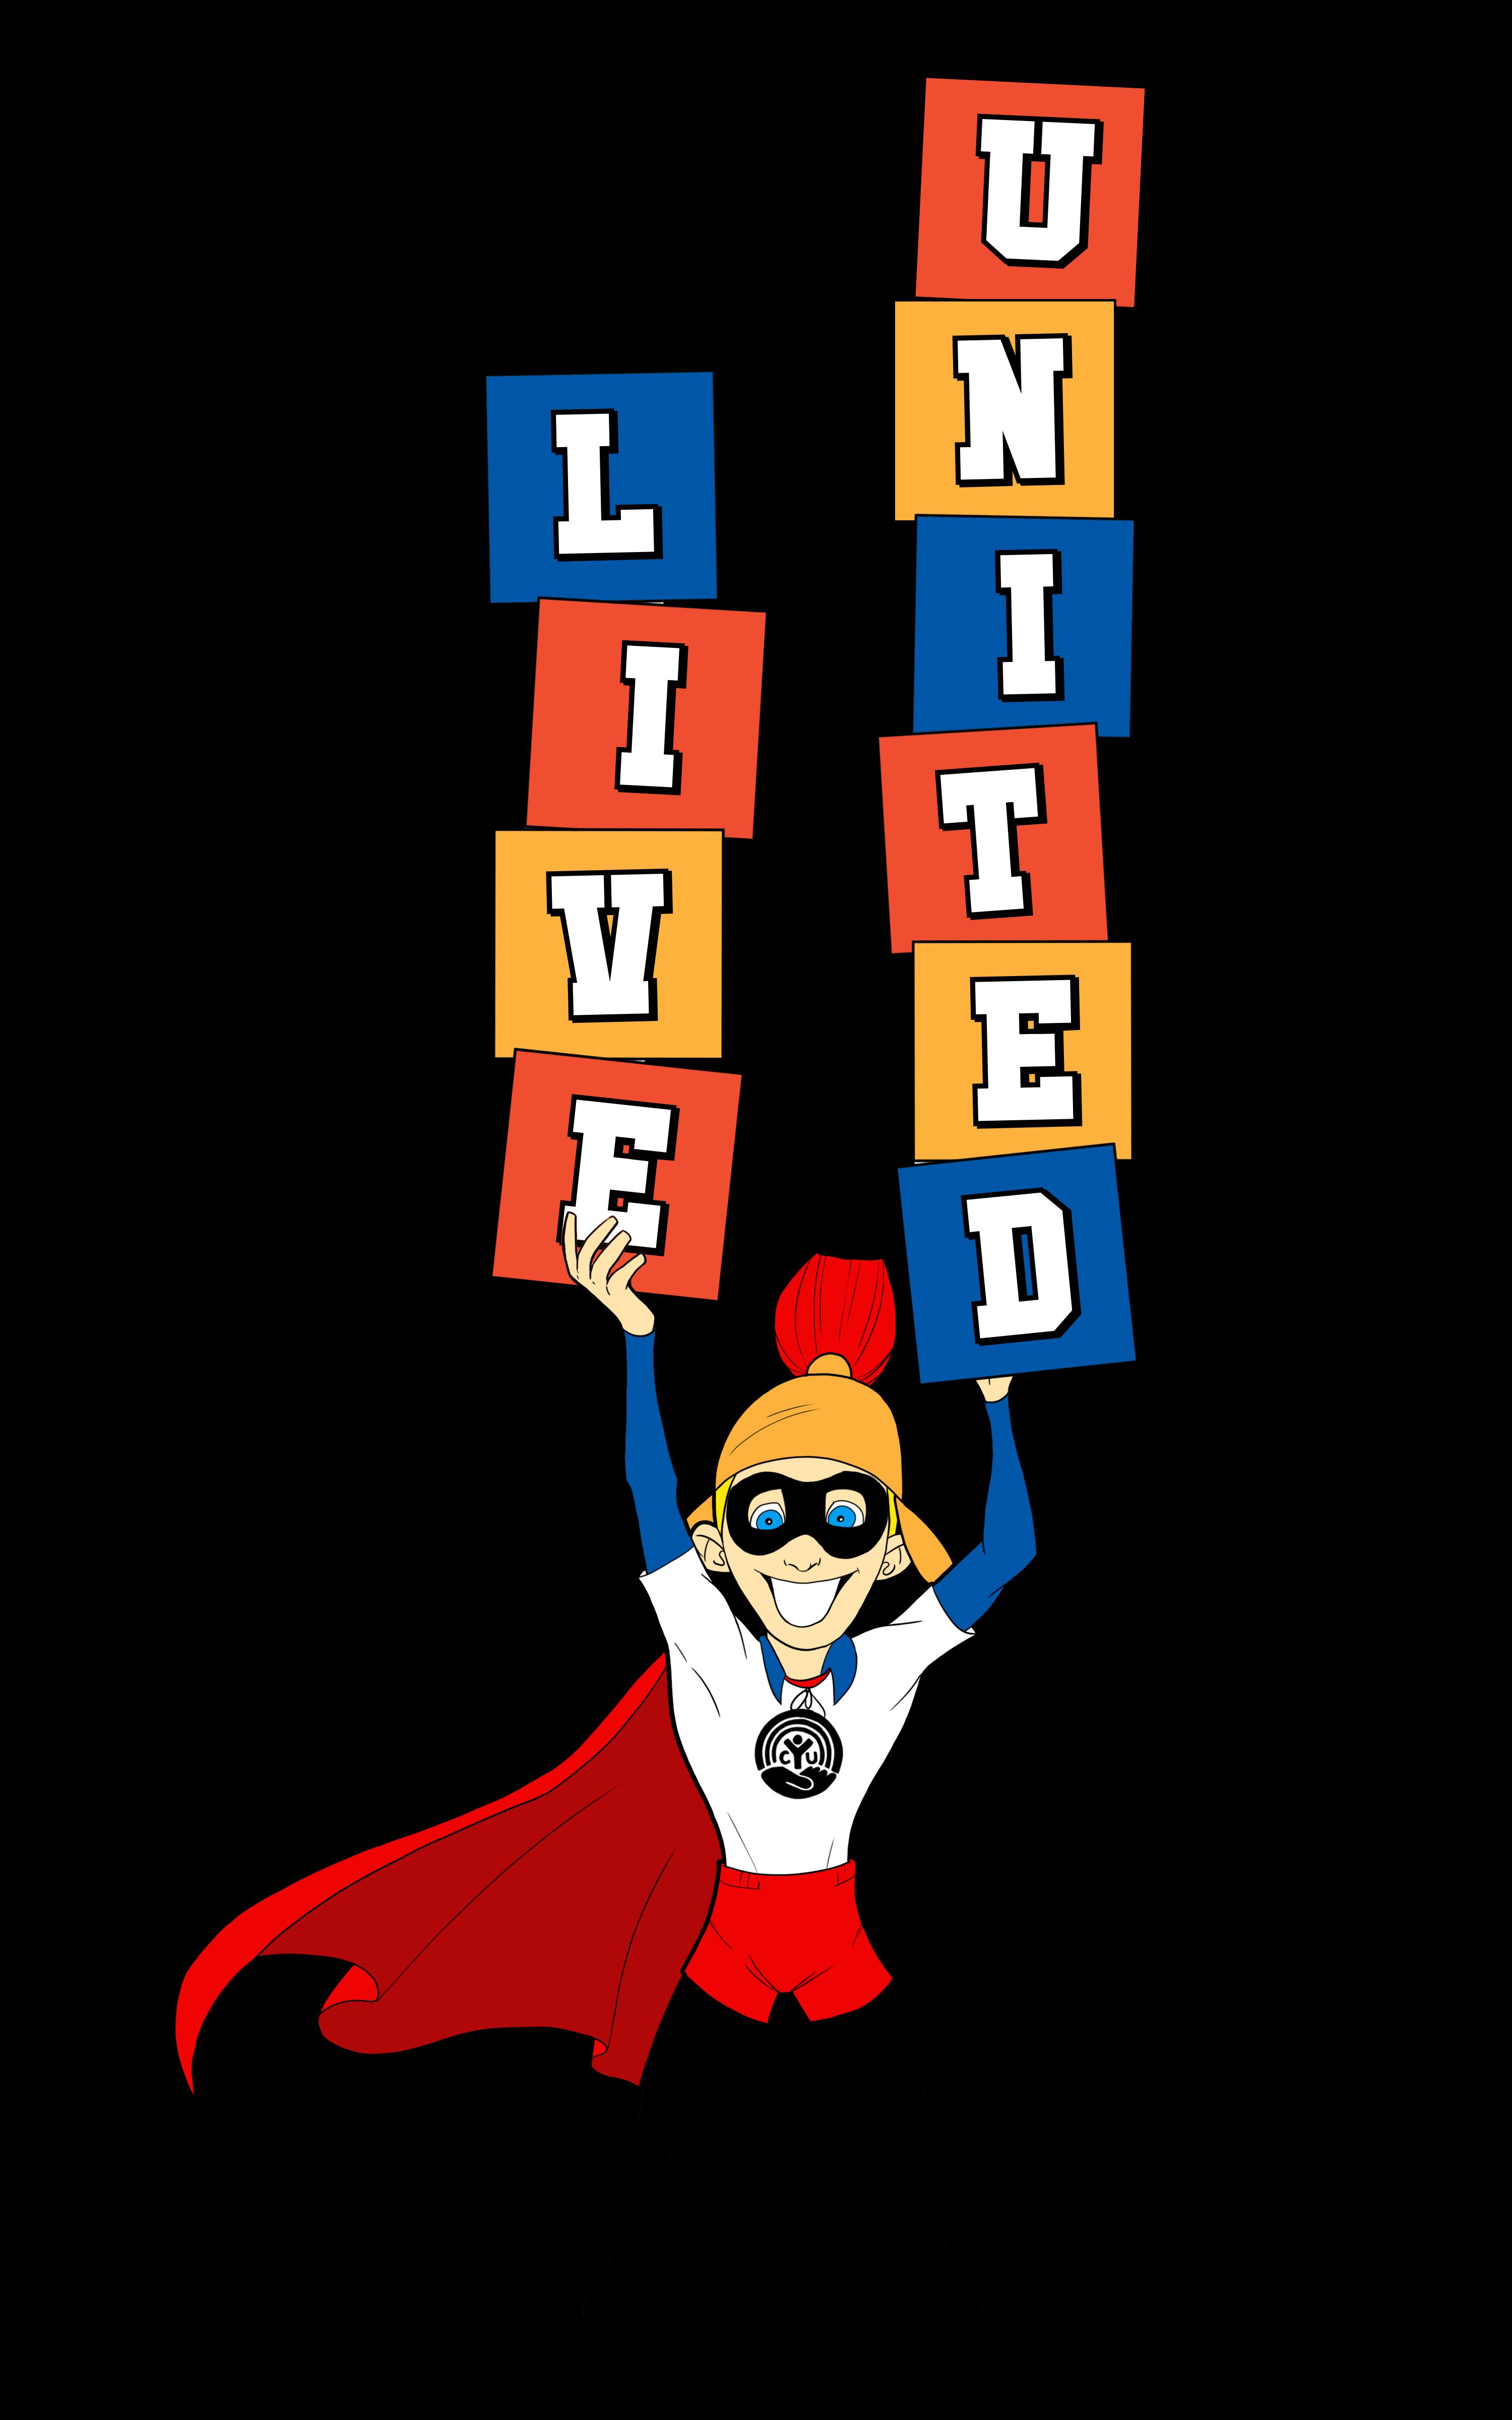 Florida clipart character. Captain united corner way